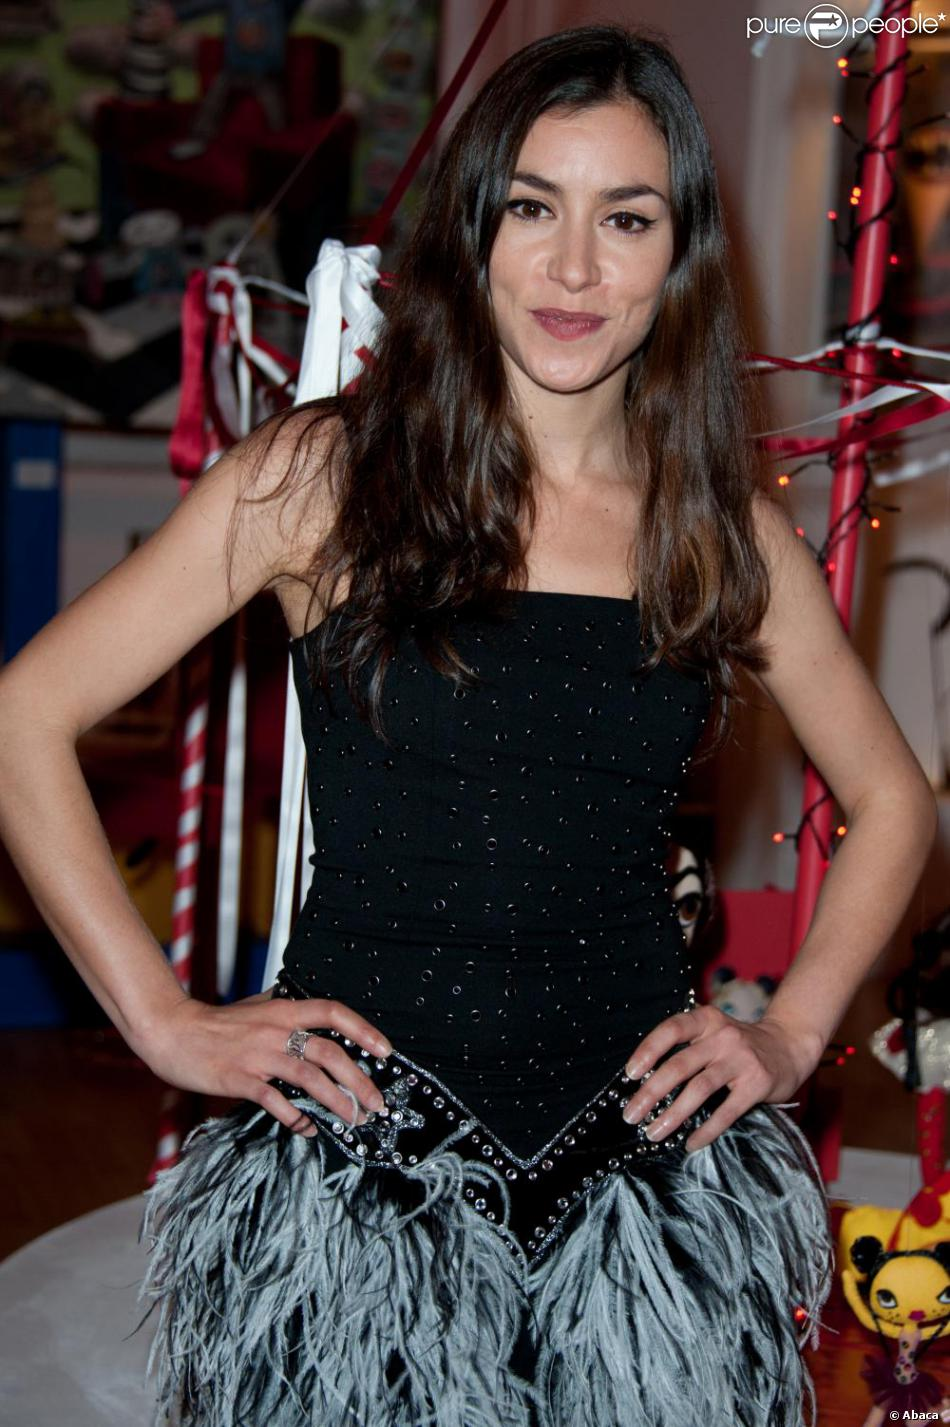 Olivia Ruiz Nude Photos 1